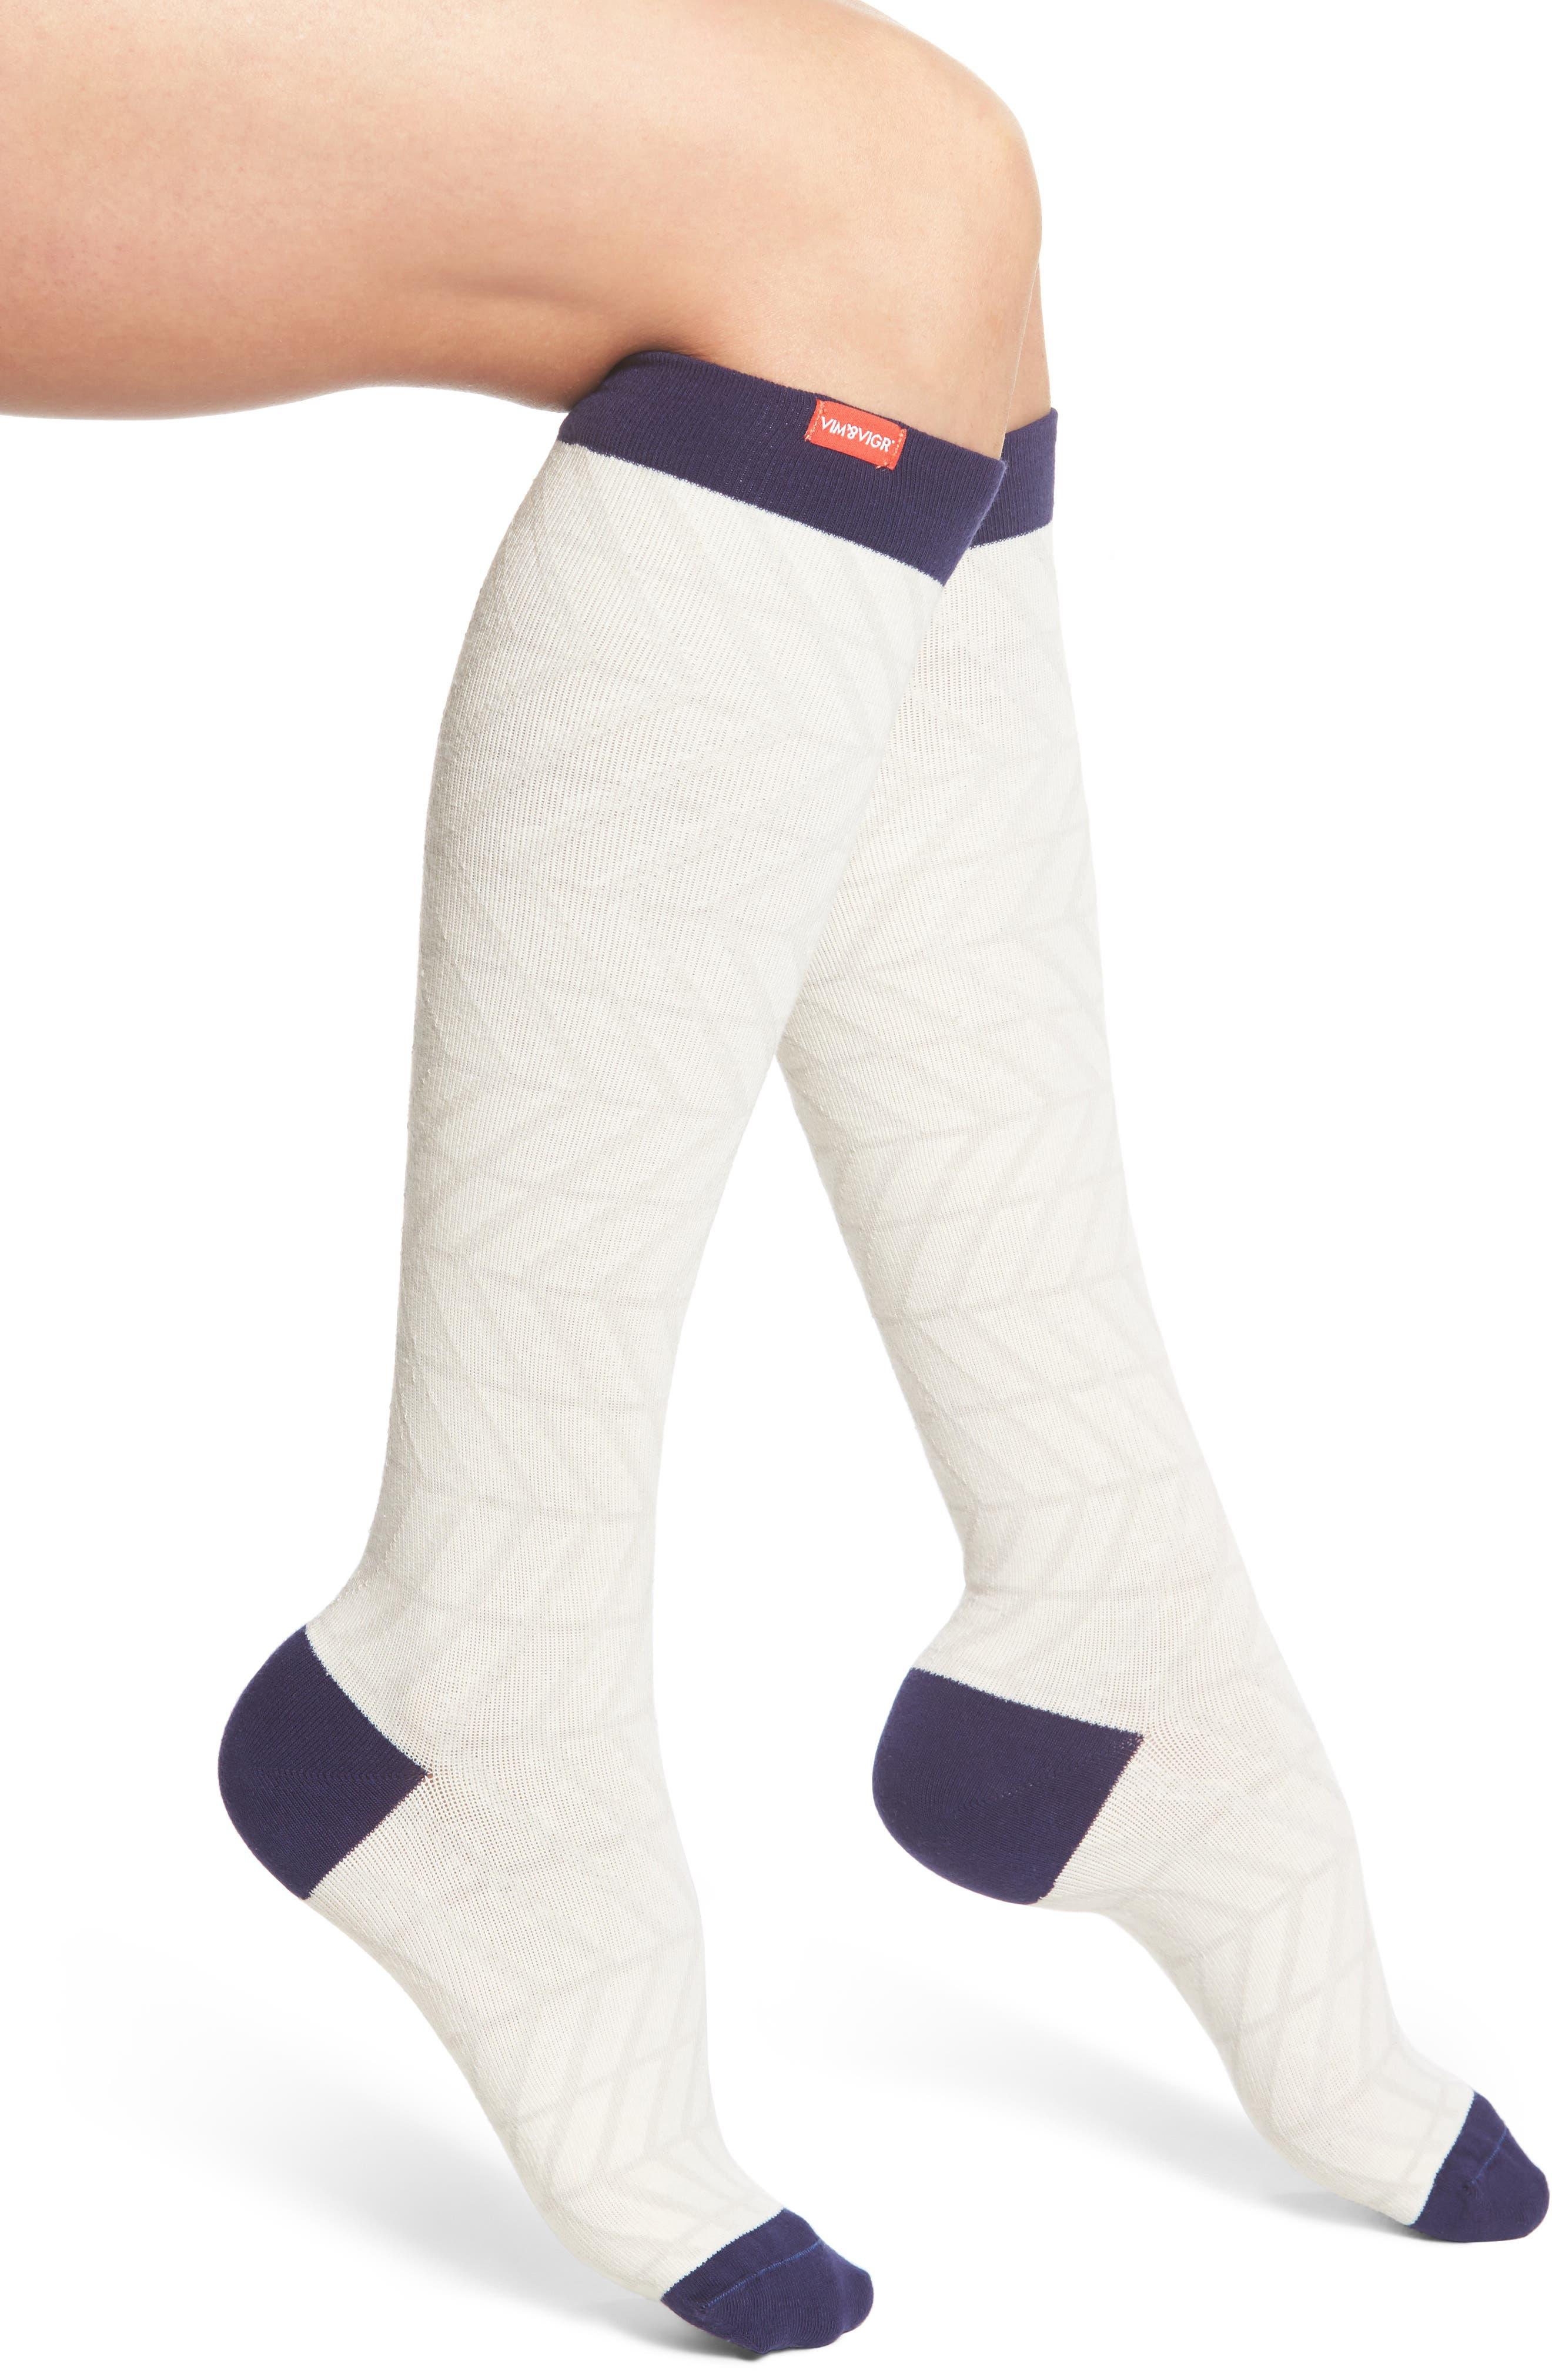 VIM & VIGR Zigzag Compression Socks, Main, color, 700